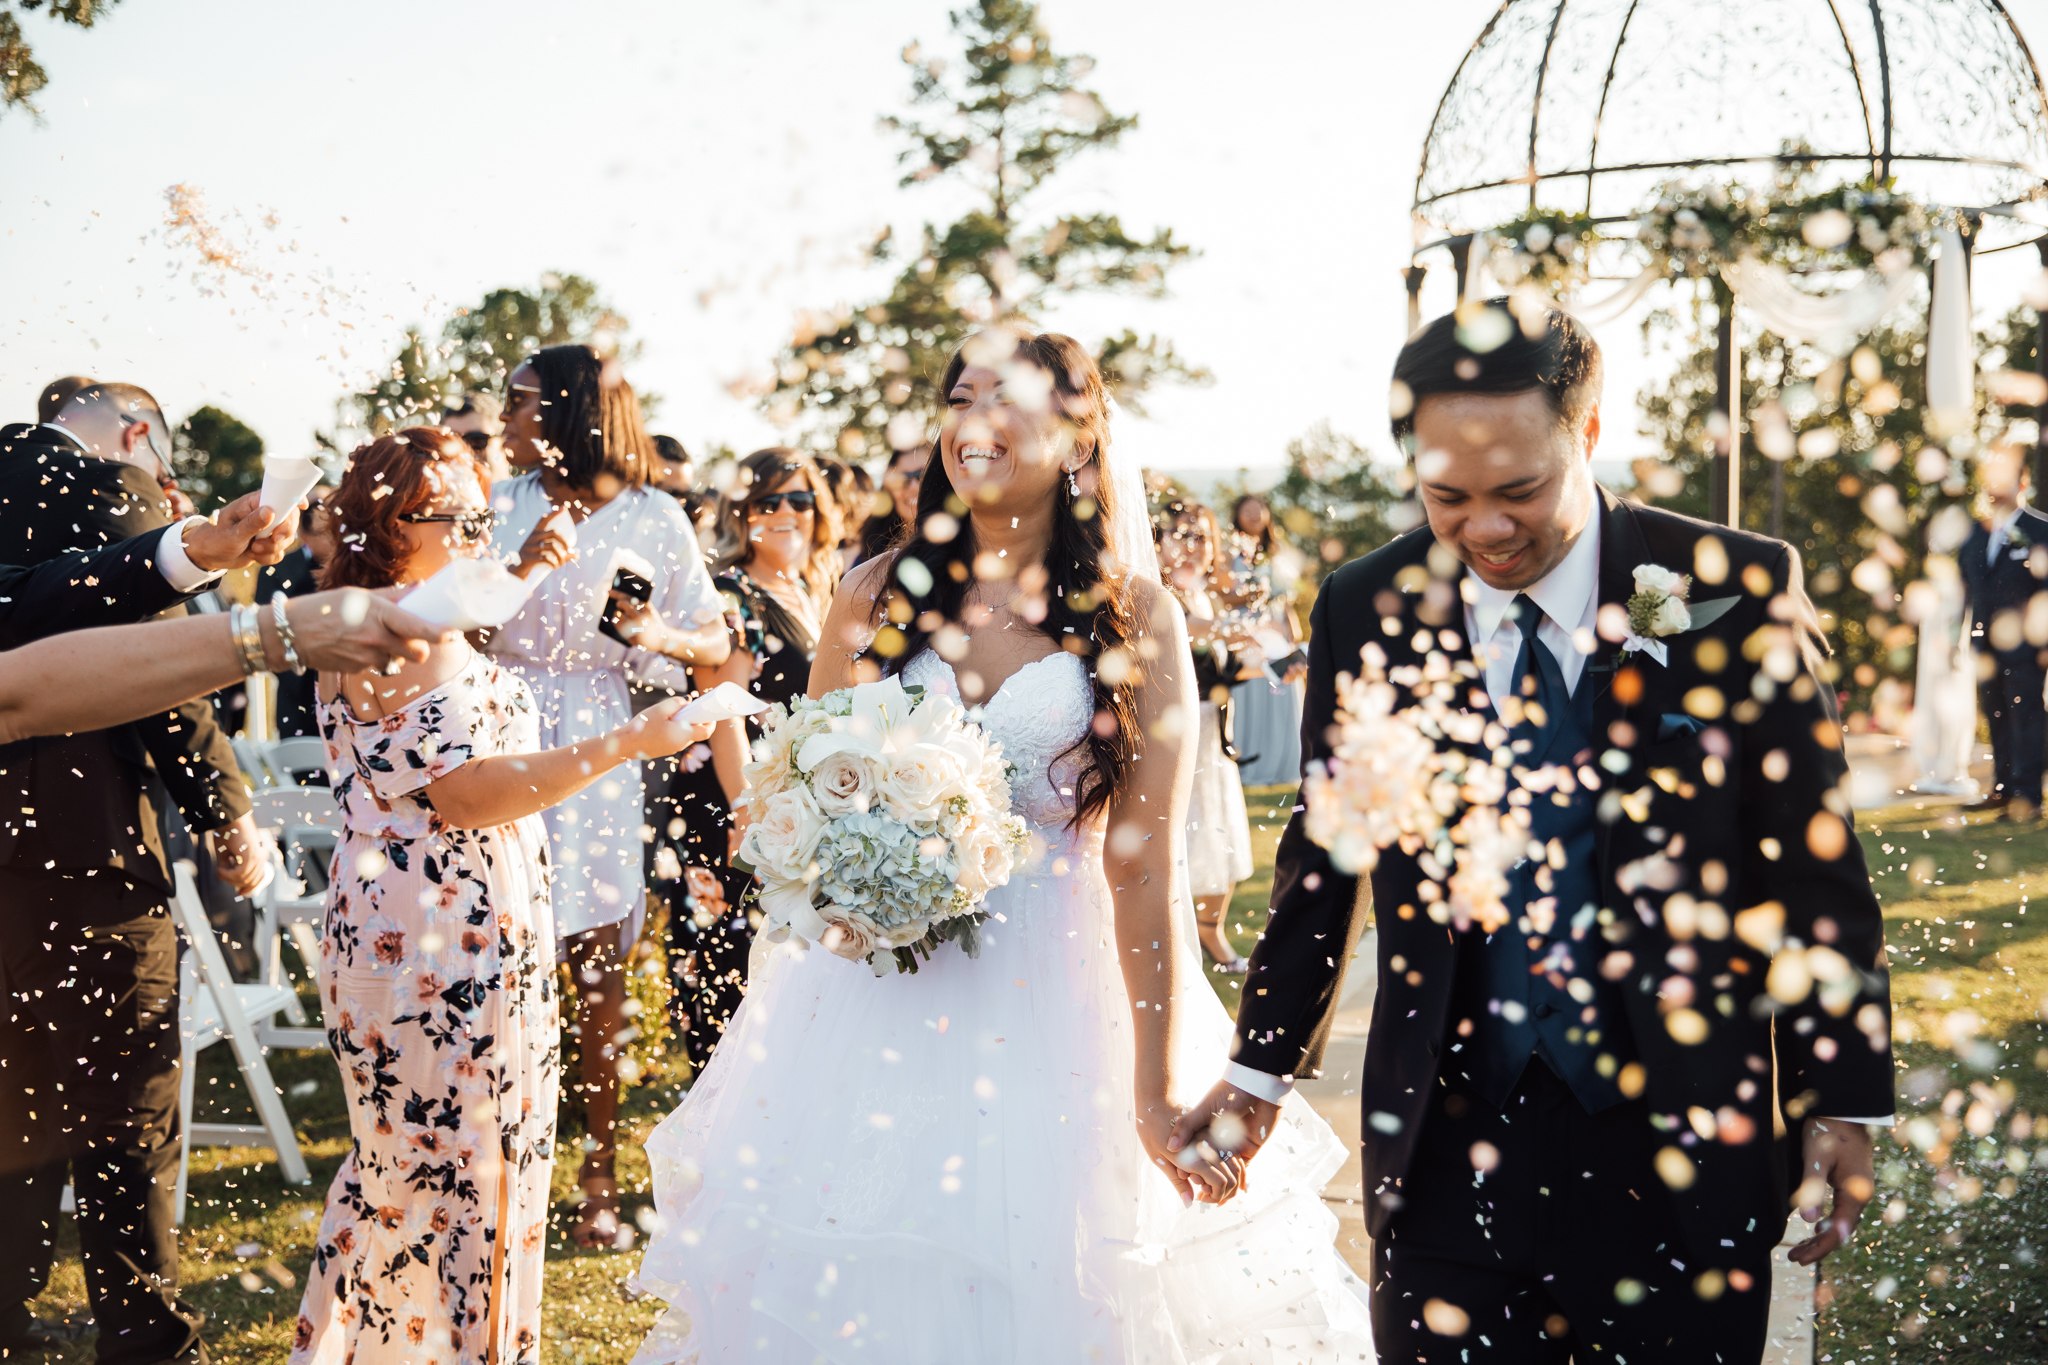 angelos-garden-little-rock-arkansas-thewarmtharoundyou-wedding-photographers (6 of 26).jpg